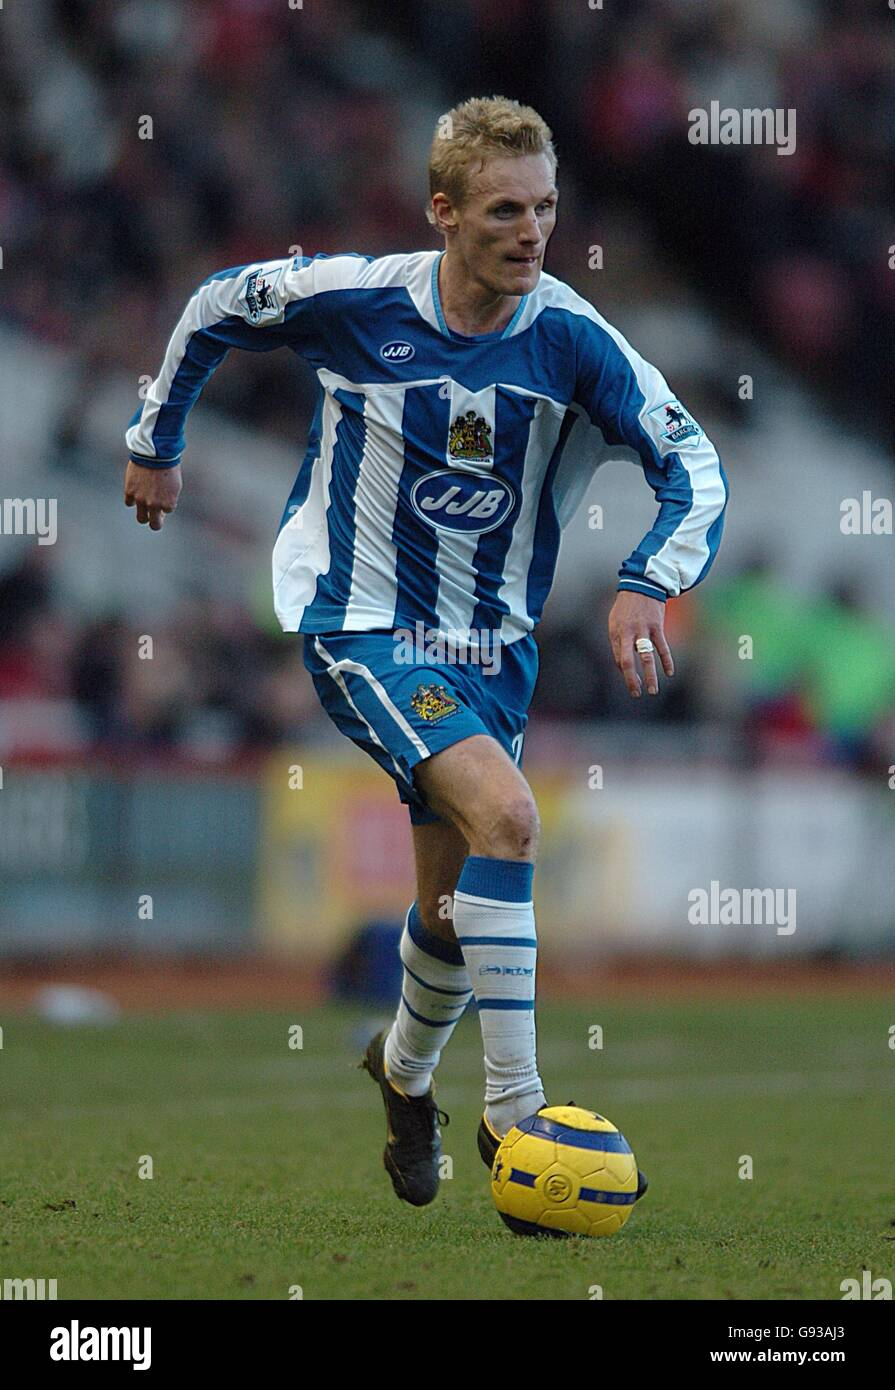 Soccer - FA Barclays Premiership - Middlesbrough v Wigan Athletic - Riverside Stadium - Stock Image